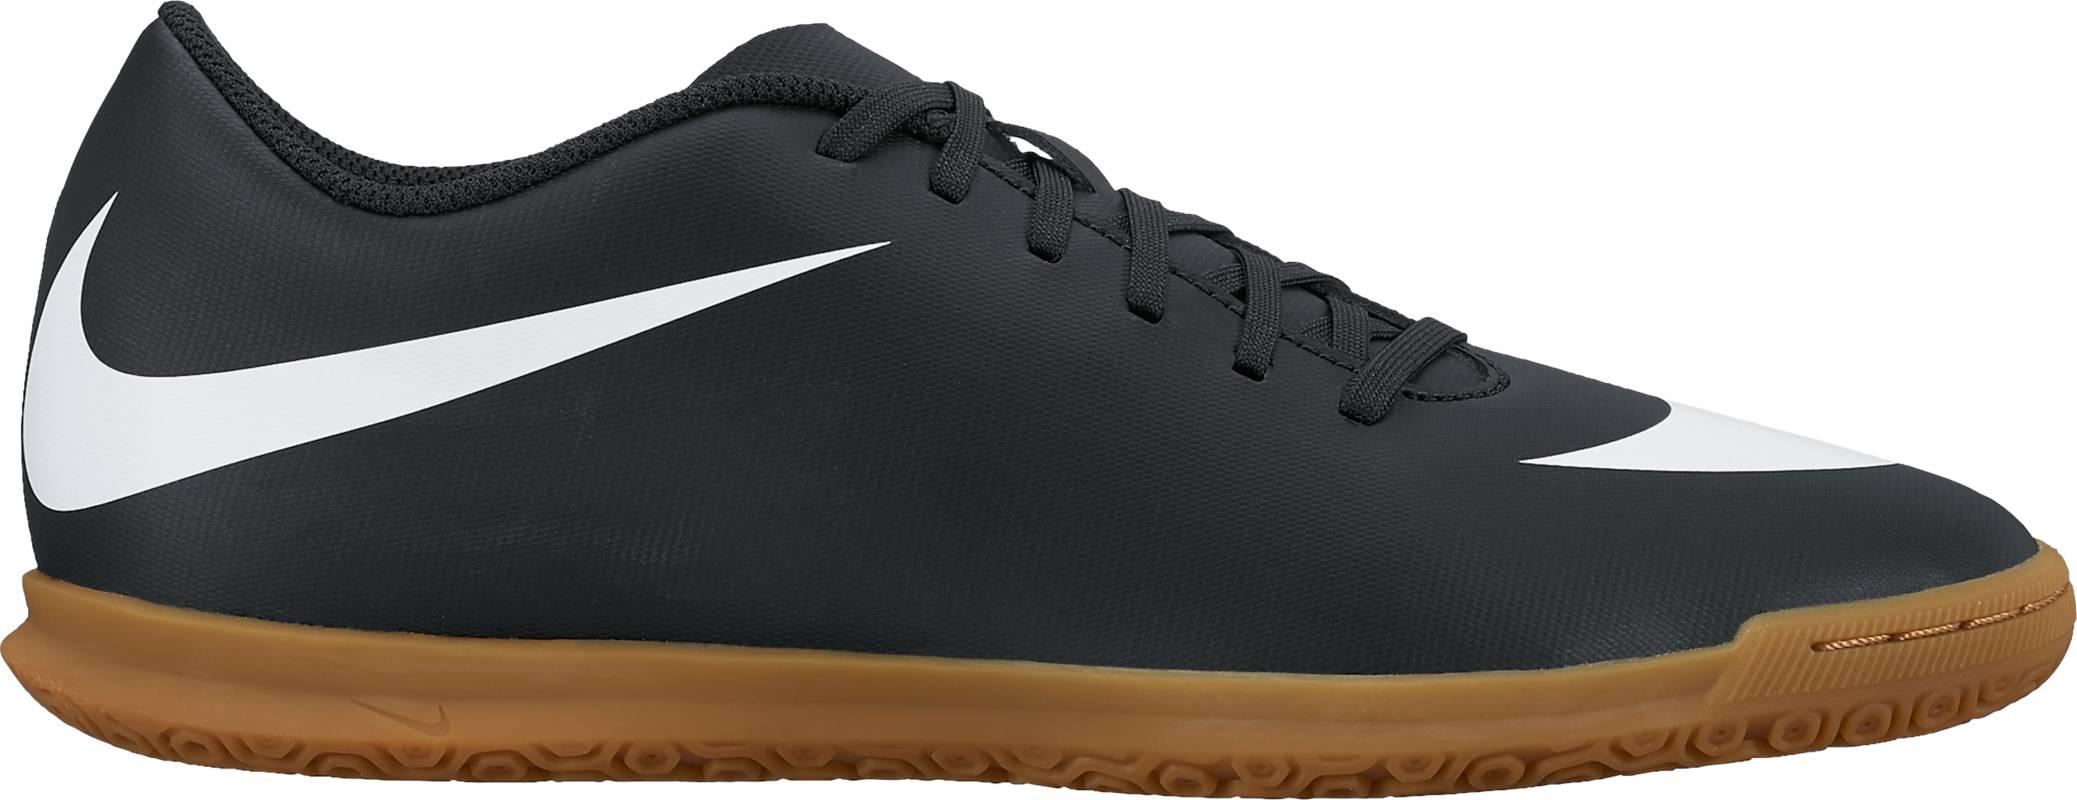 Бутсы мужские Nike Bravatax Ii Ic, цвет: черный. 844441-001. Размер 12,5 (46)844441-001